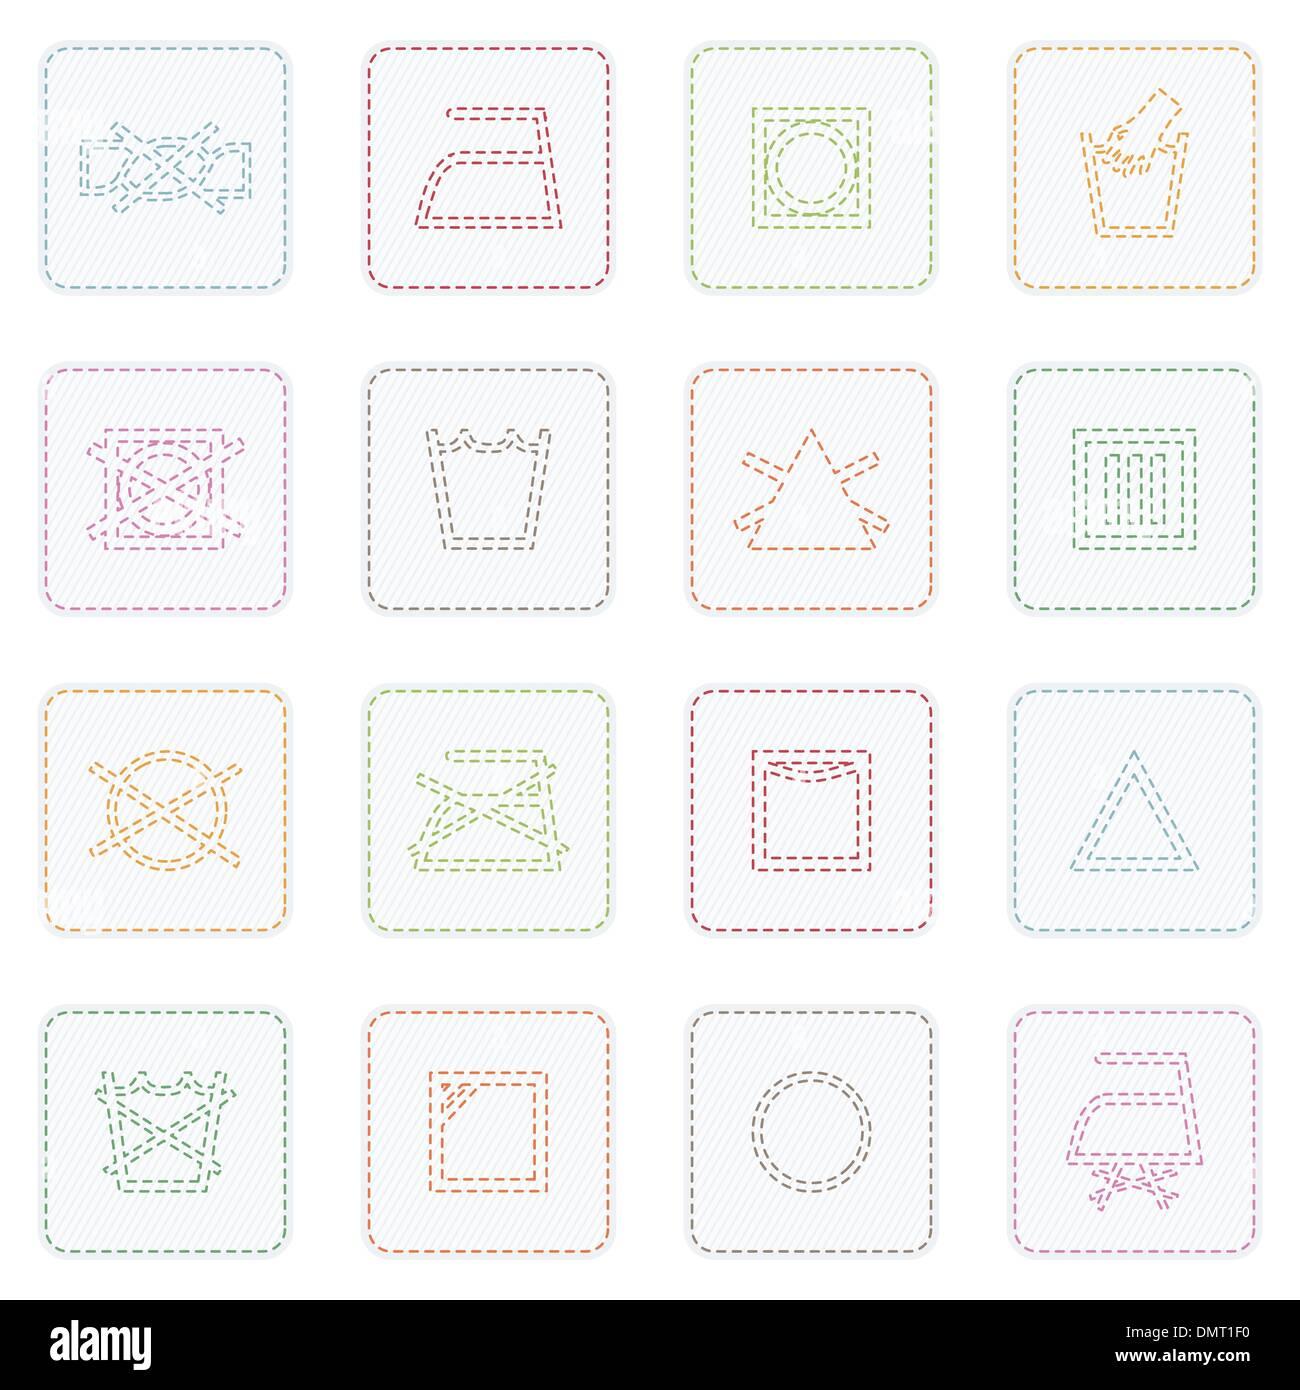 Fabric Care Symbols Stock Photos Fabric Care Symbols Stock Images